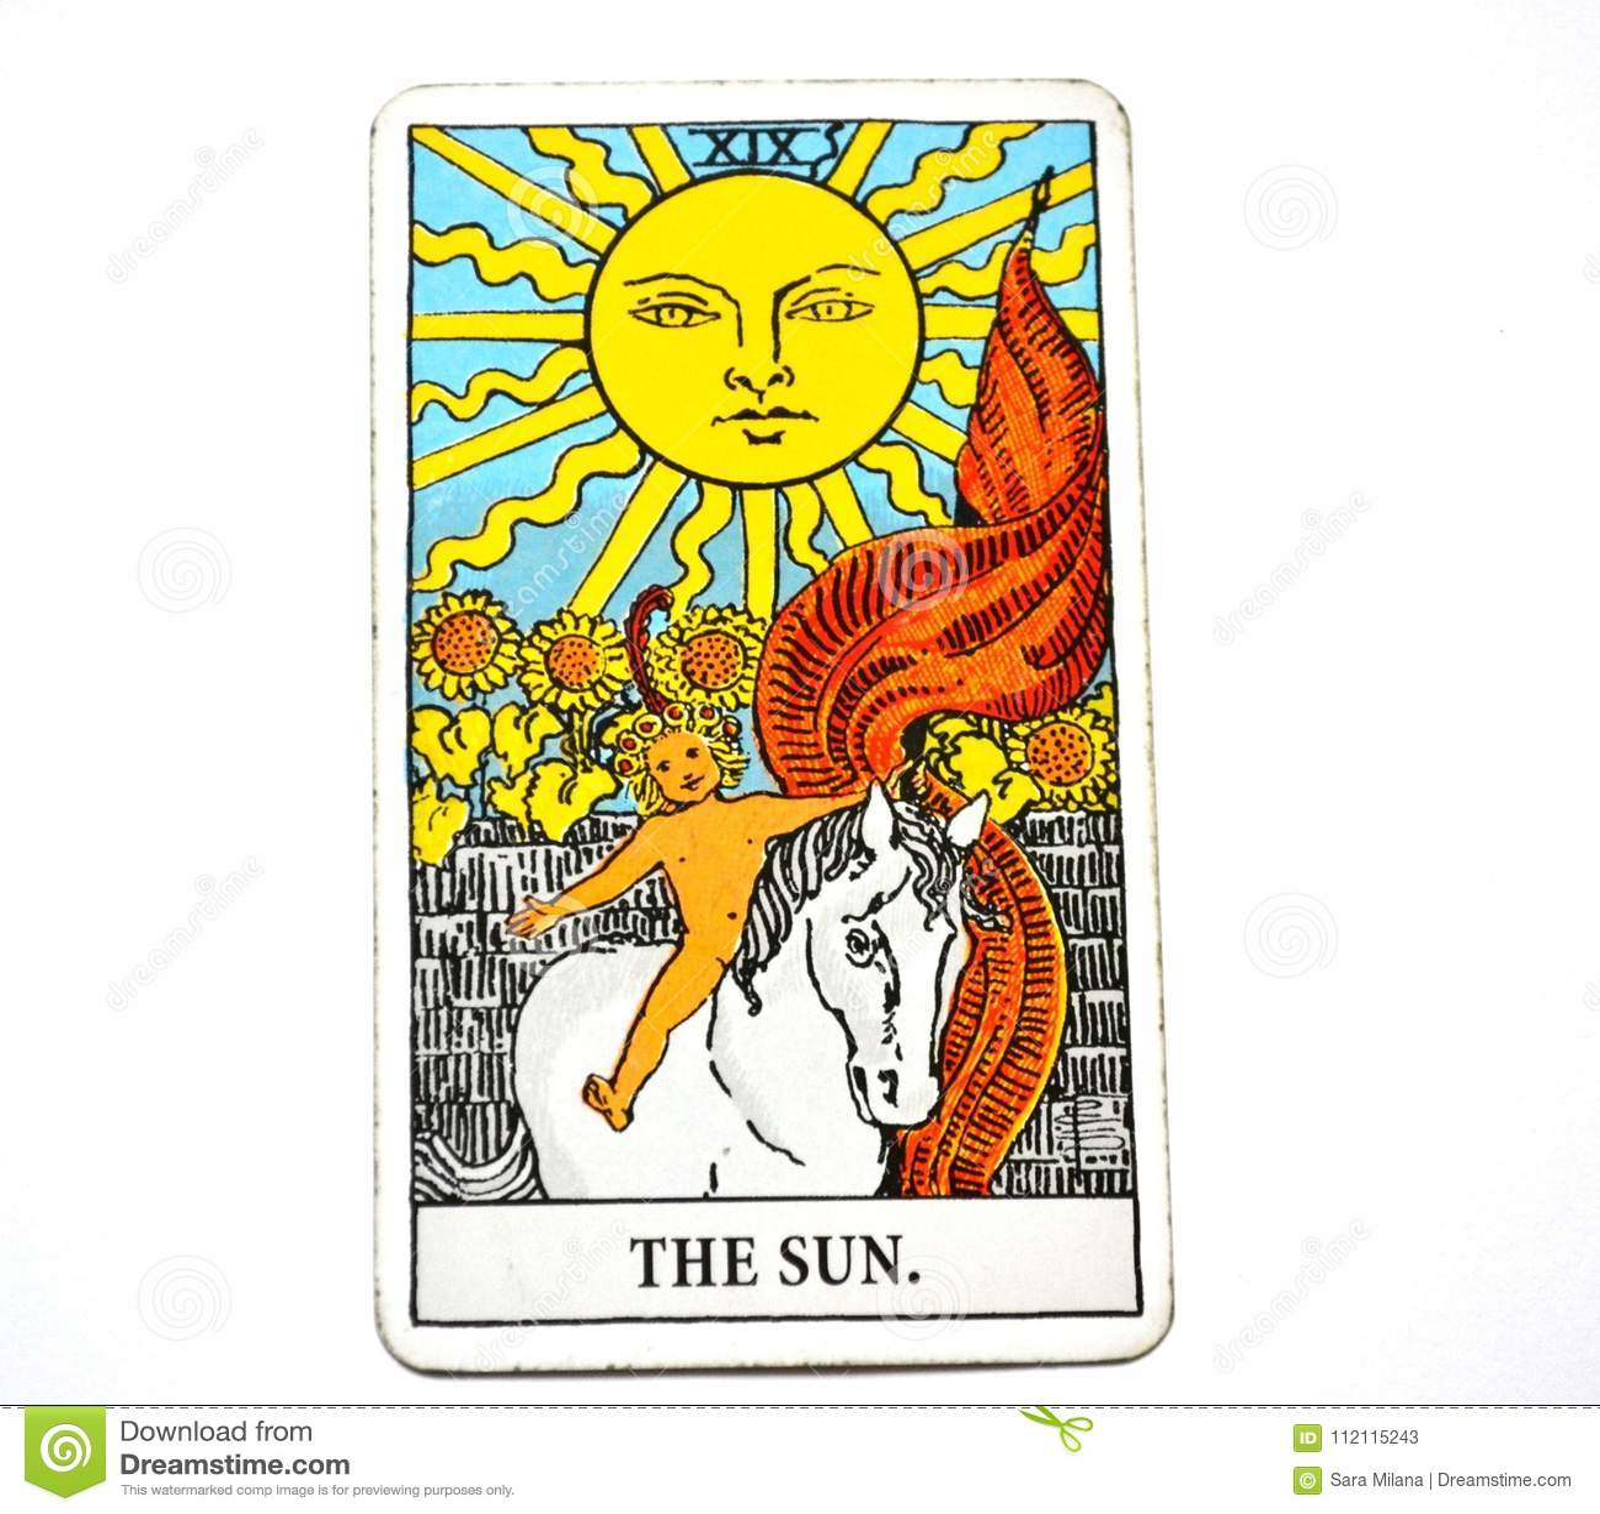 The Sun Tarot Card Life energy vitality joy enlightenment warmth manifestation happiness